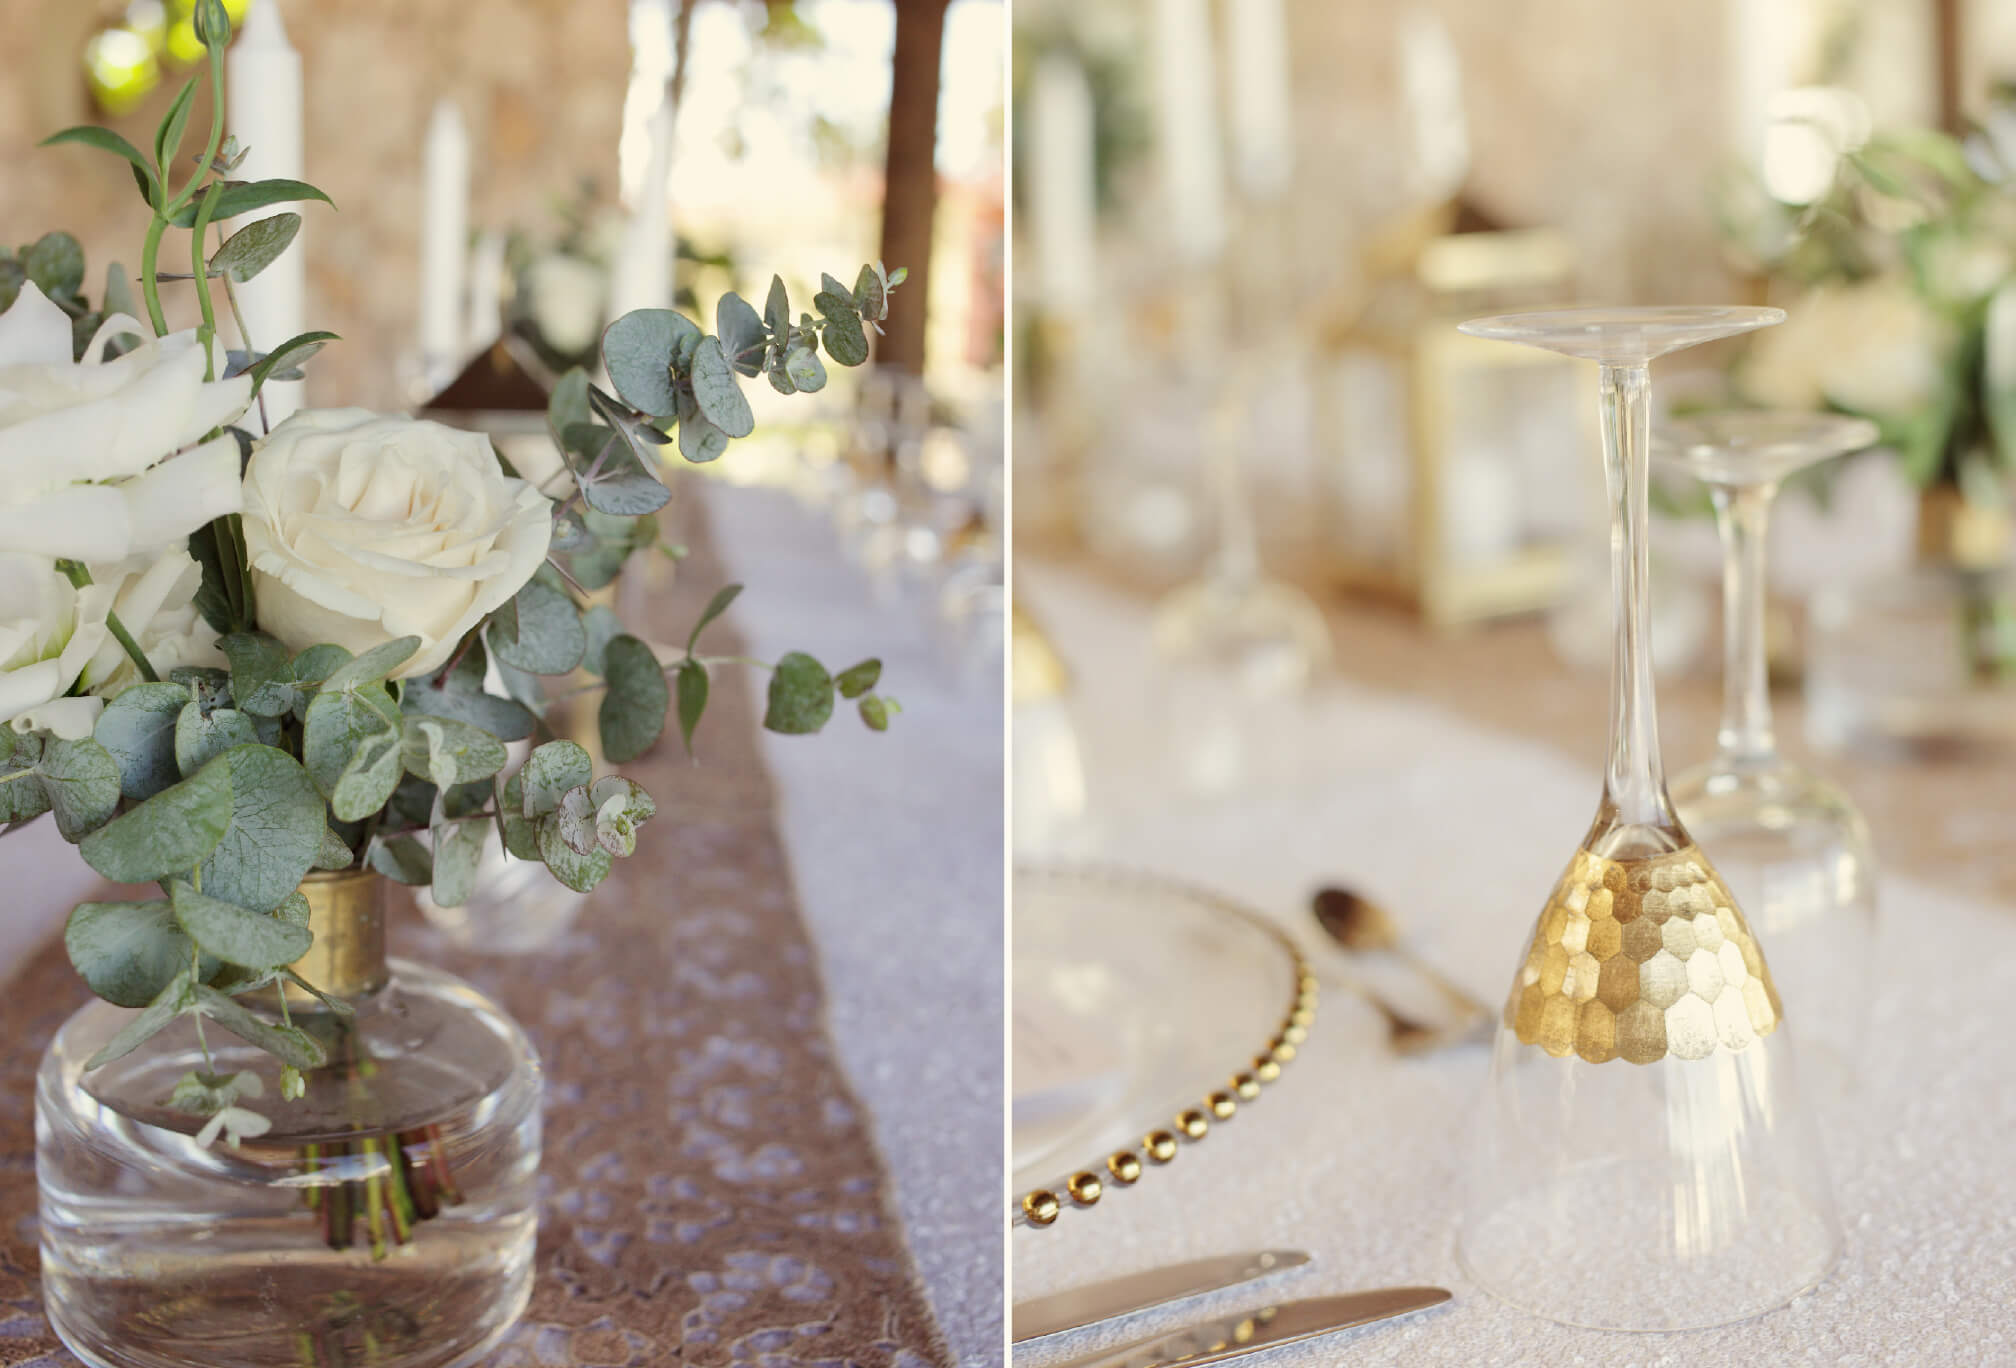 jellyfish punta cana wedding decor